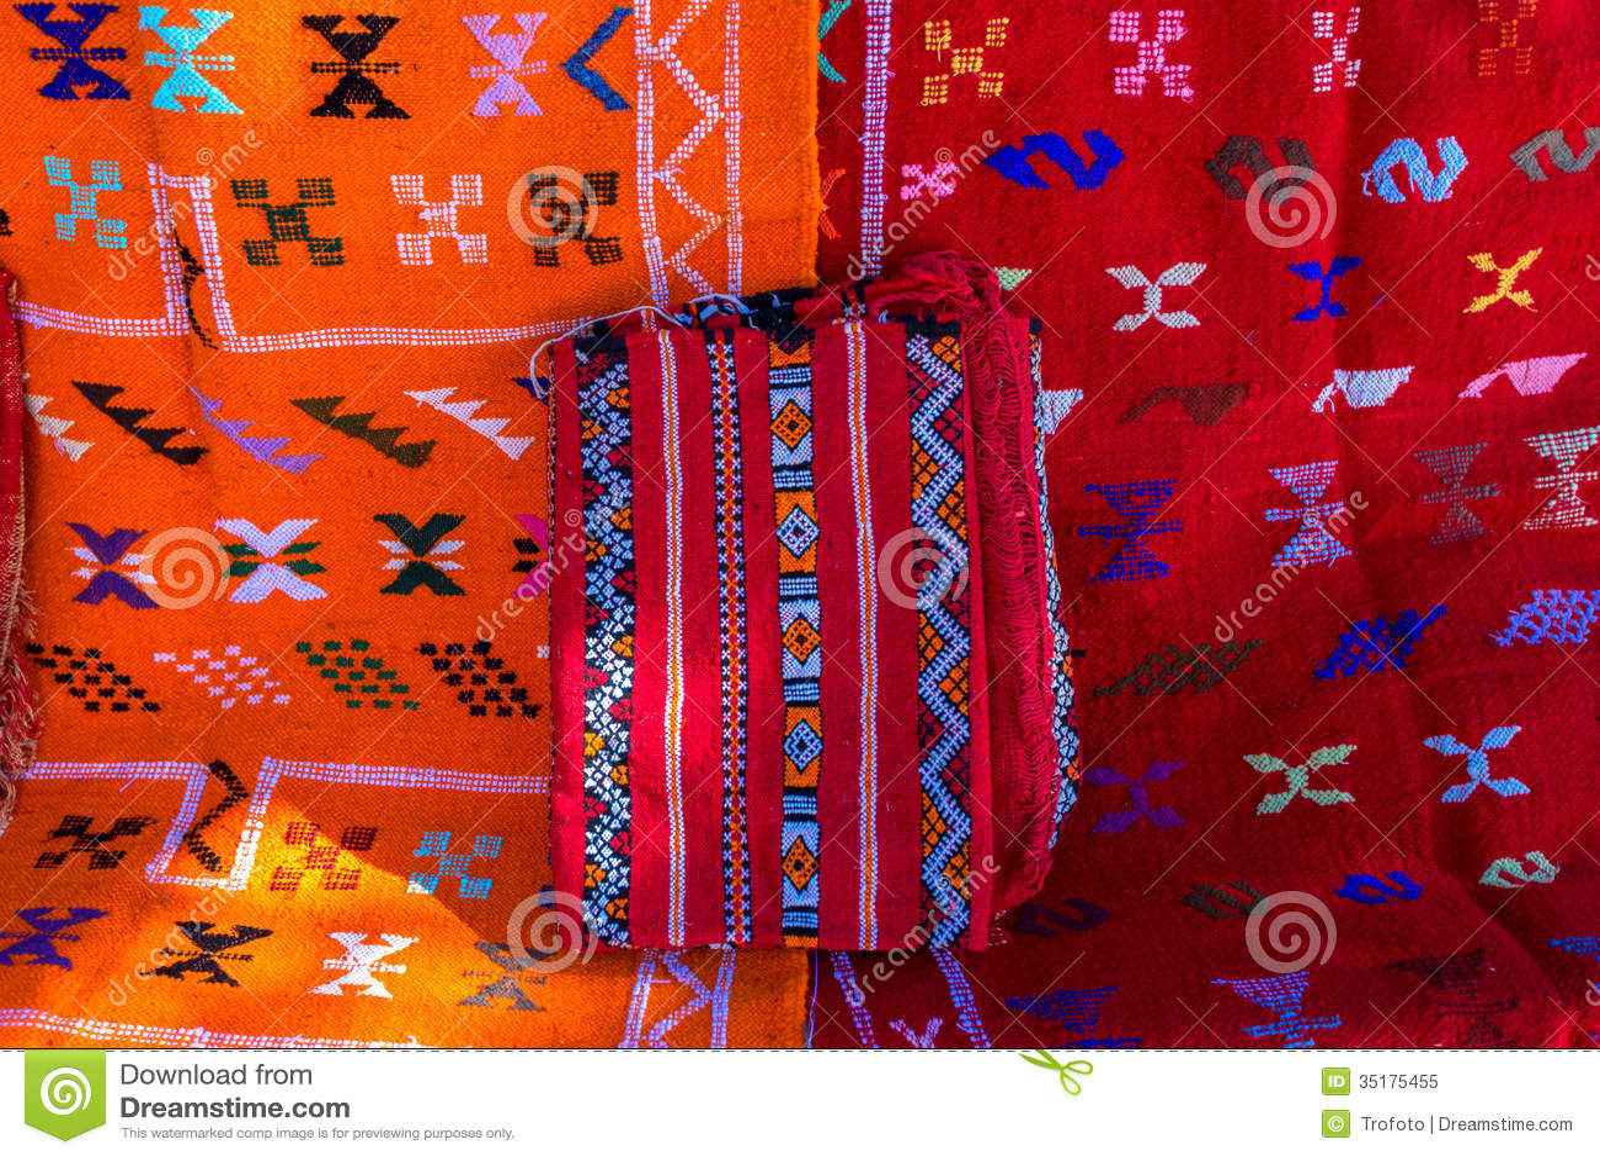 tapis marocain photo libre de droits image 35175455. Black Bedroom Furniture Sets. Home Design Ideas